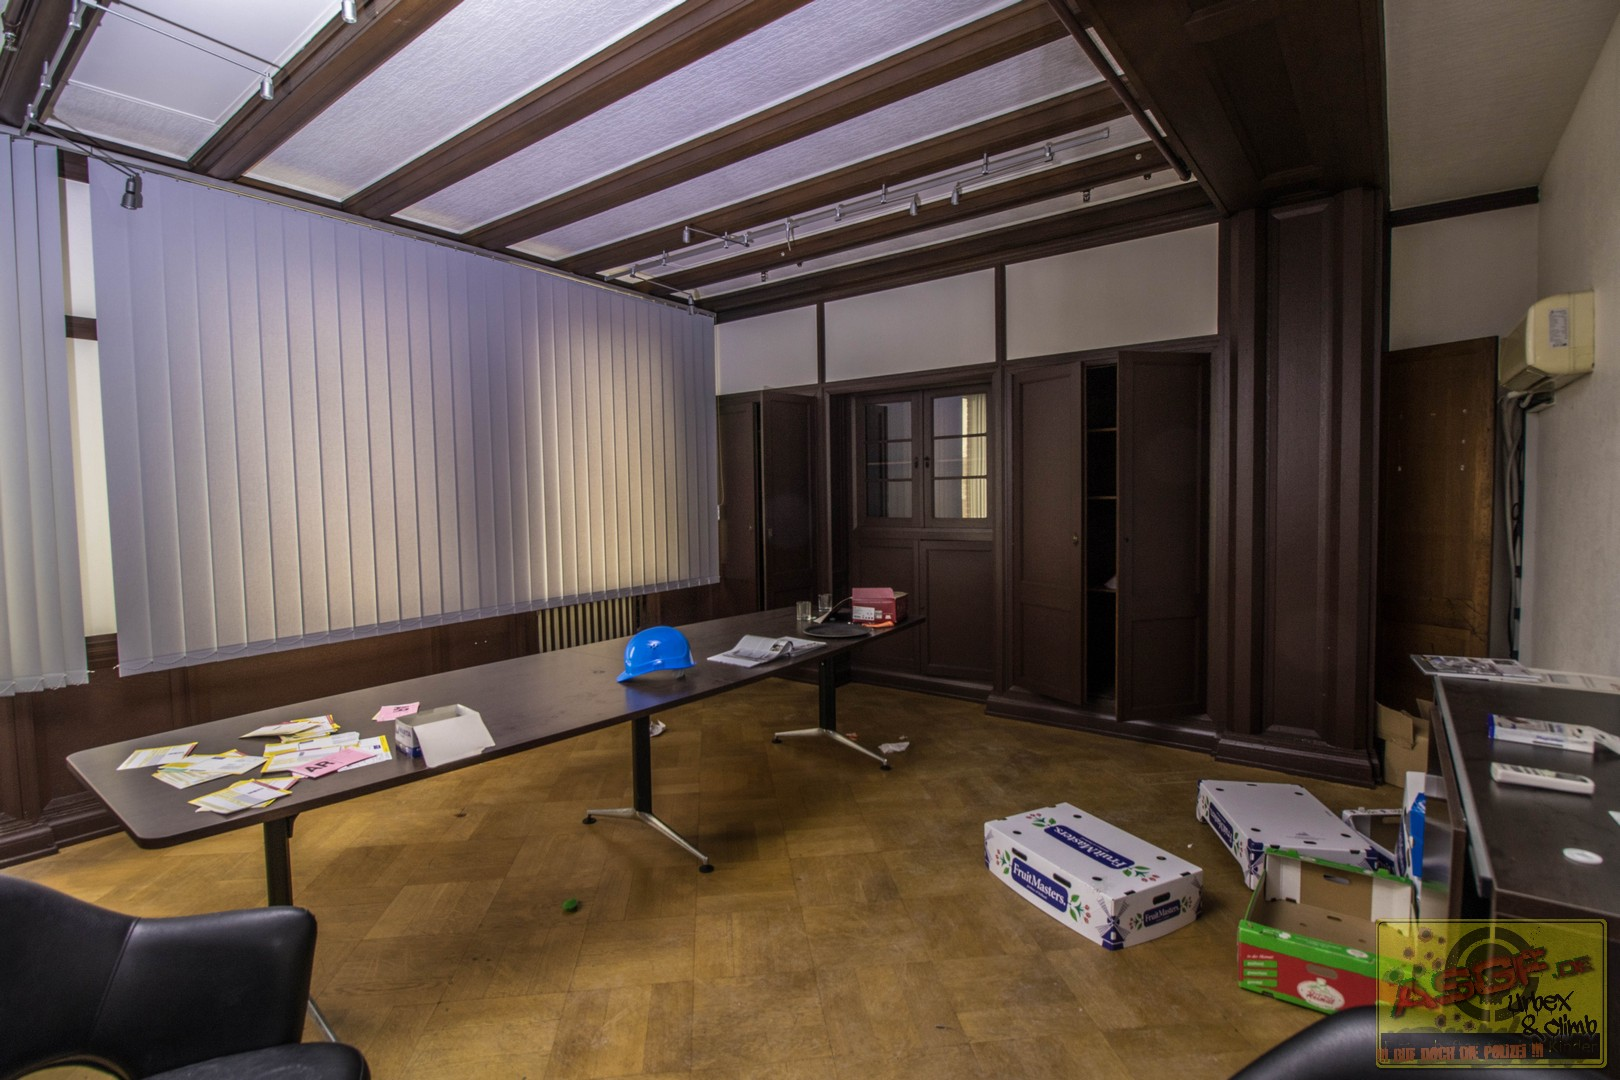 papierfabrik10032019-24